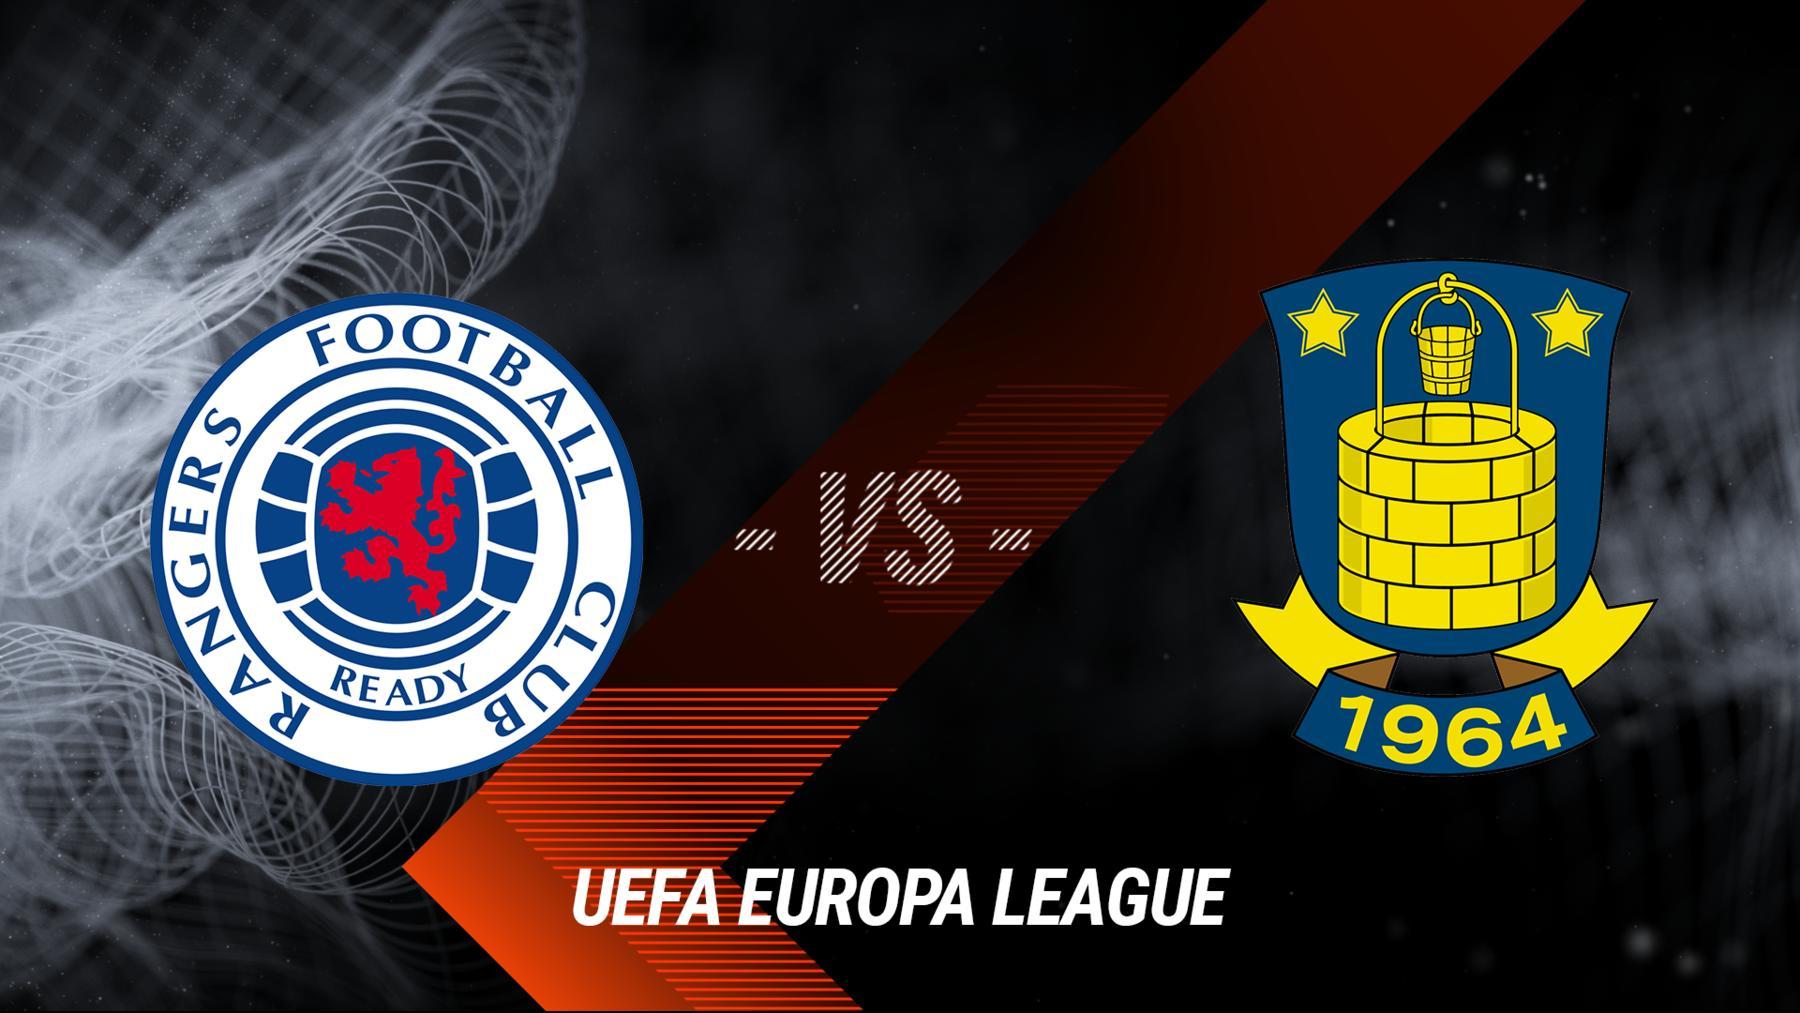 Glasgow Rangers - Bröndby IF